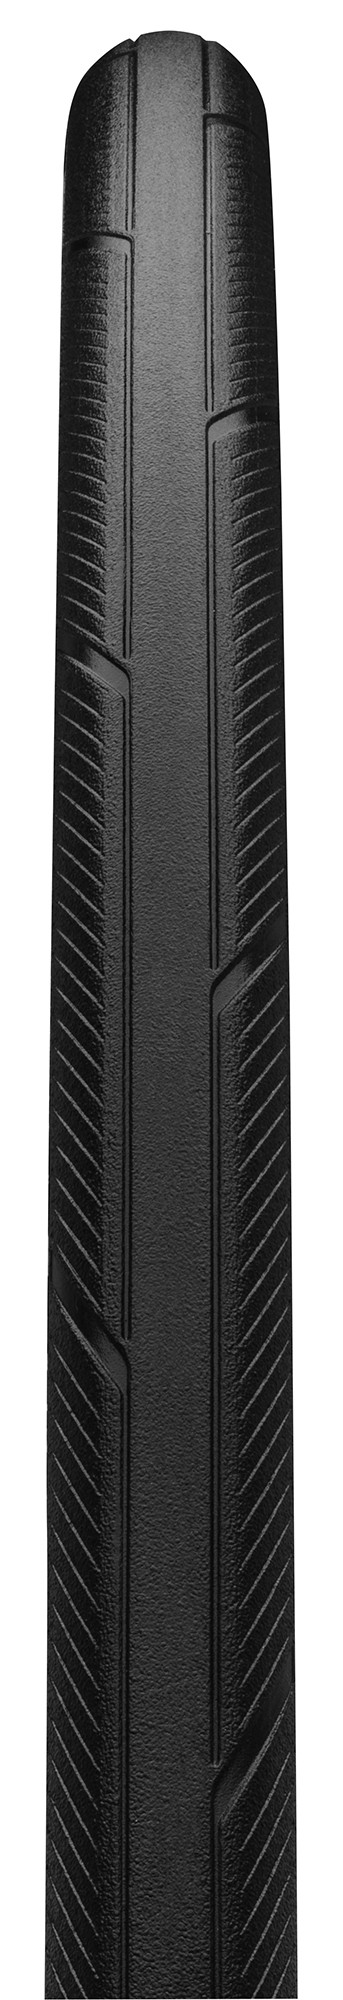 Anvelopa Pliabila Continental UltraSport III 25-584 negru/negru - Wheelsports